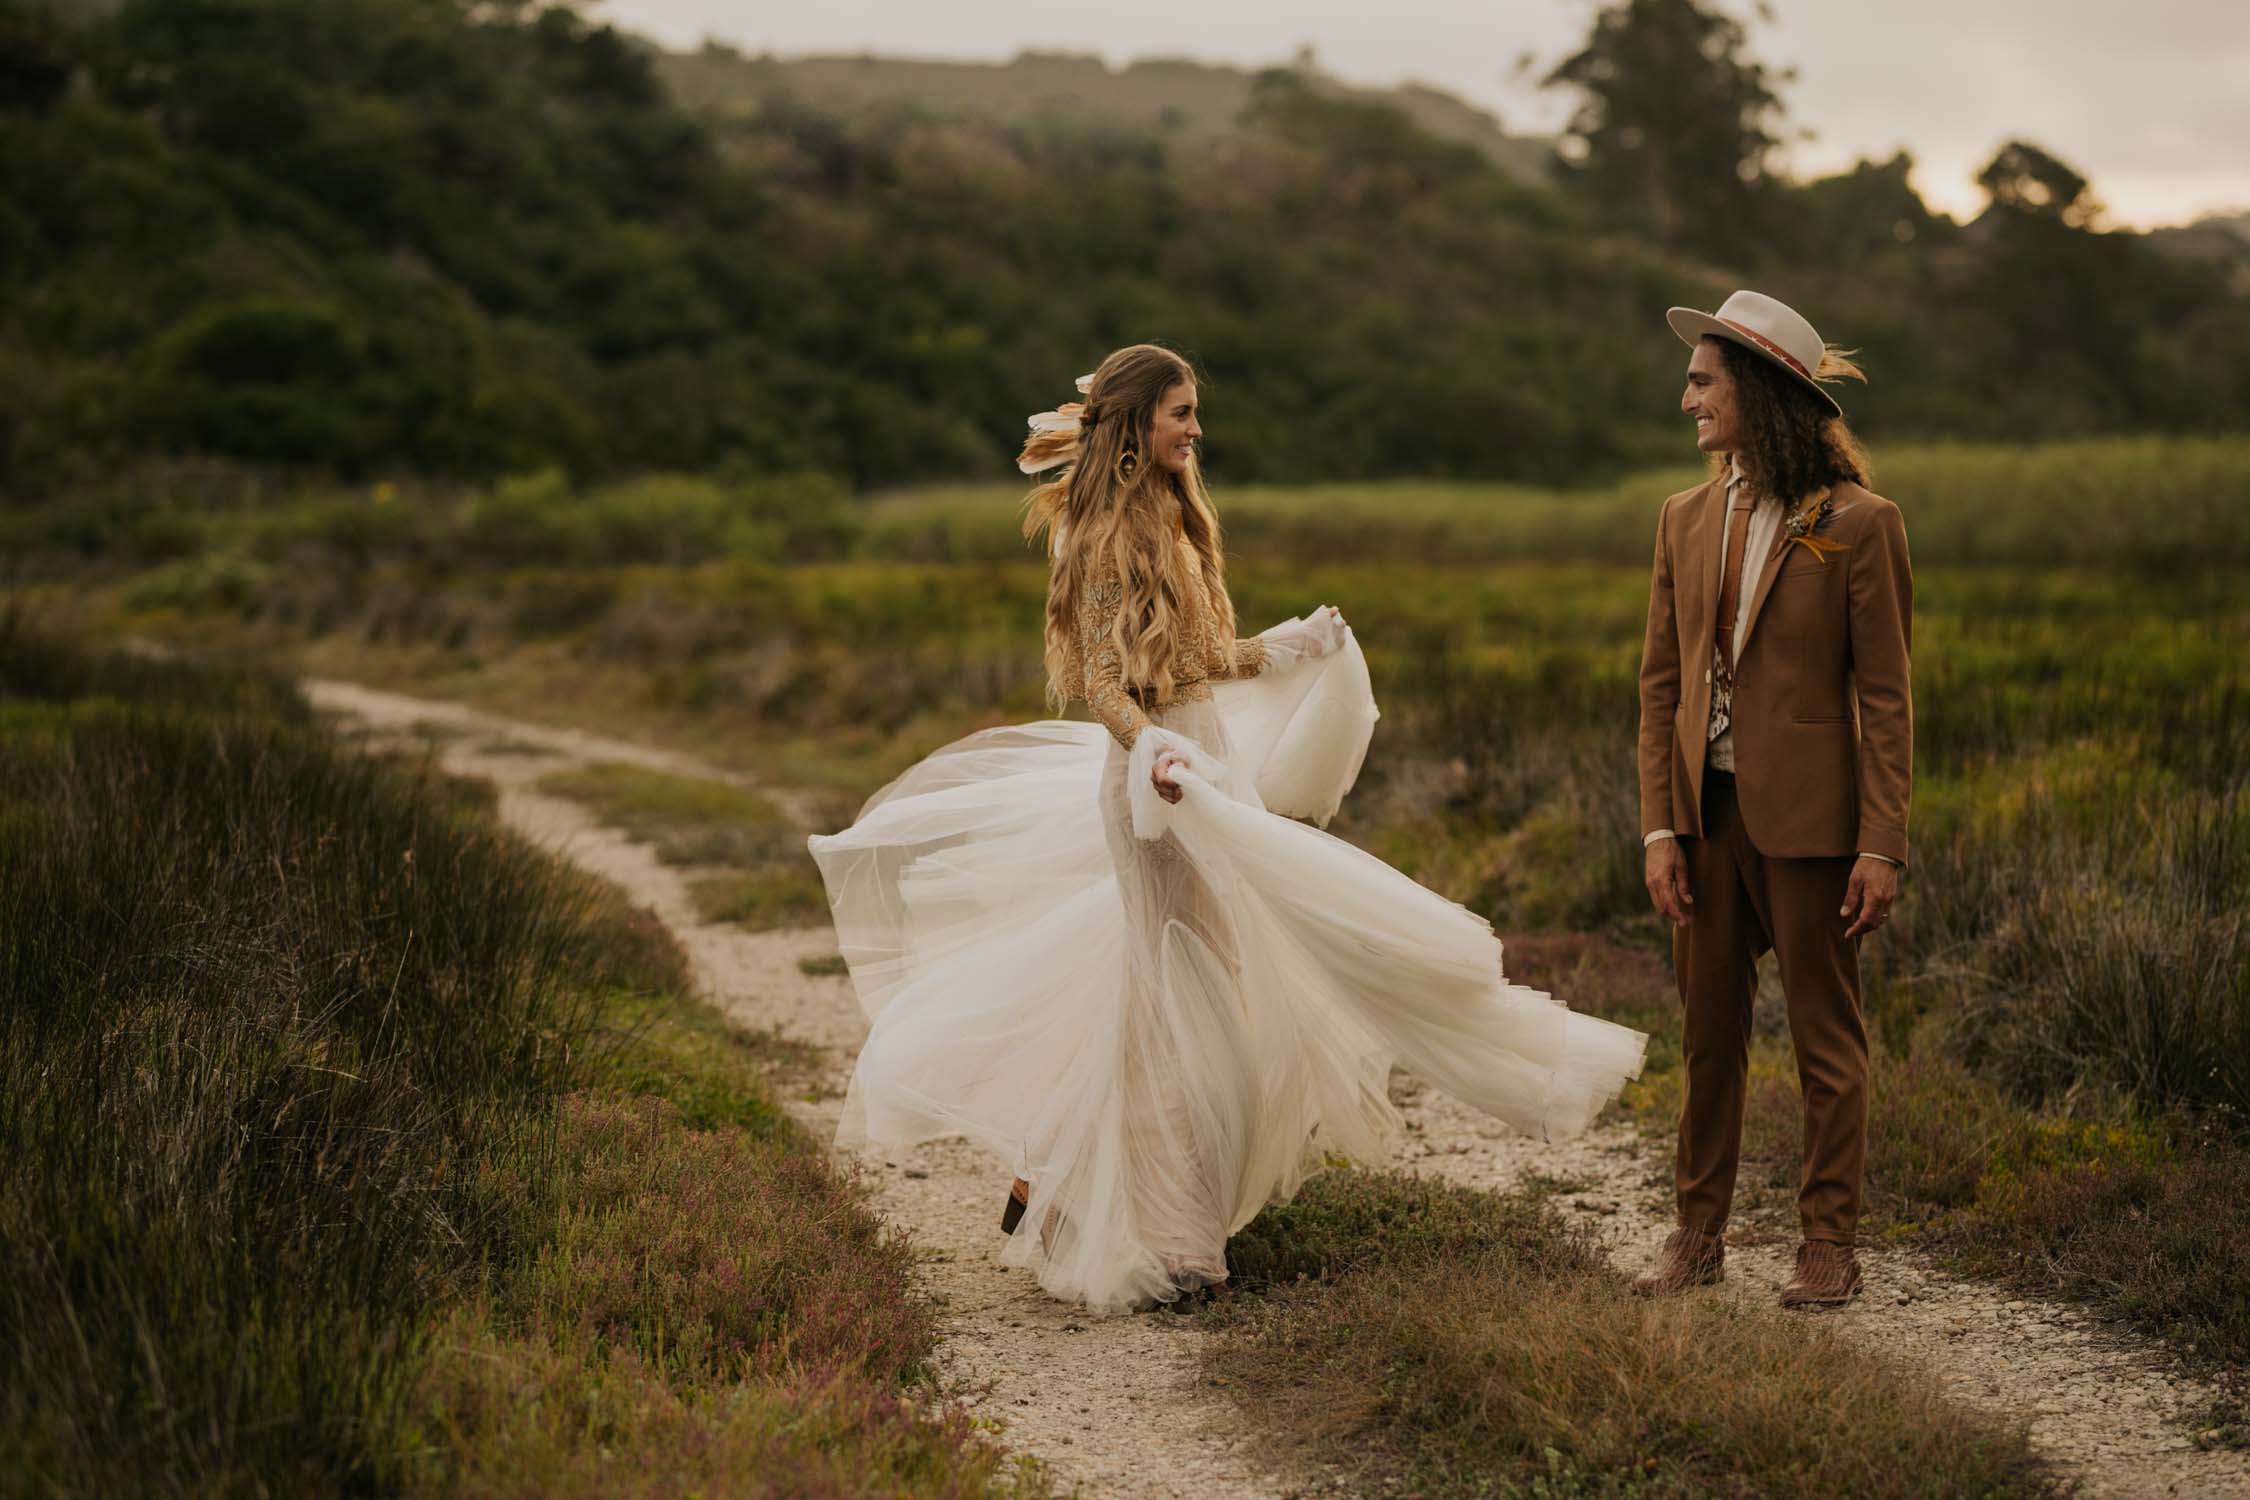 Award winning Vancouver Wedding Photographer takes amazing romantic photo of boho bride spinning for groom at destination wedding